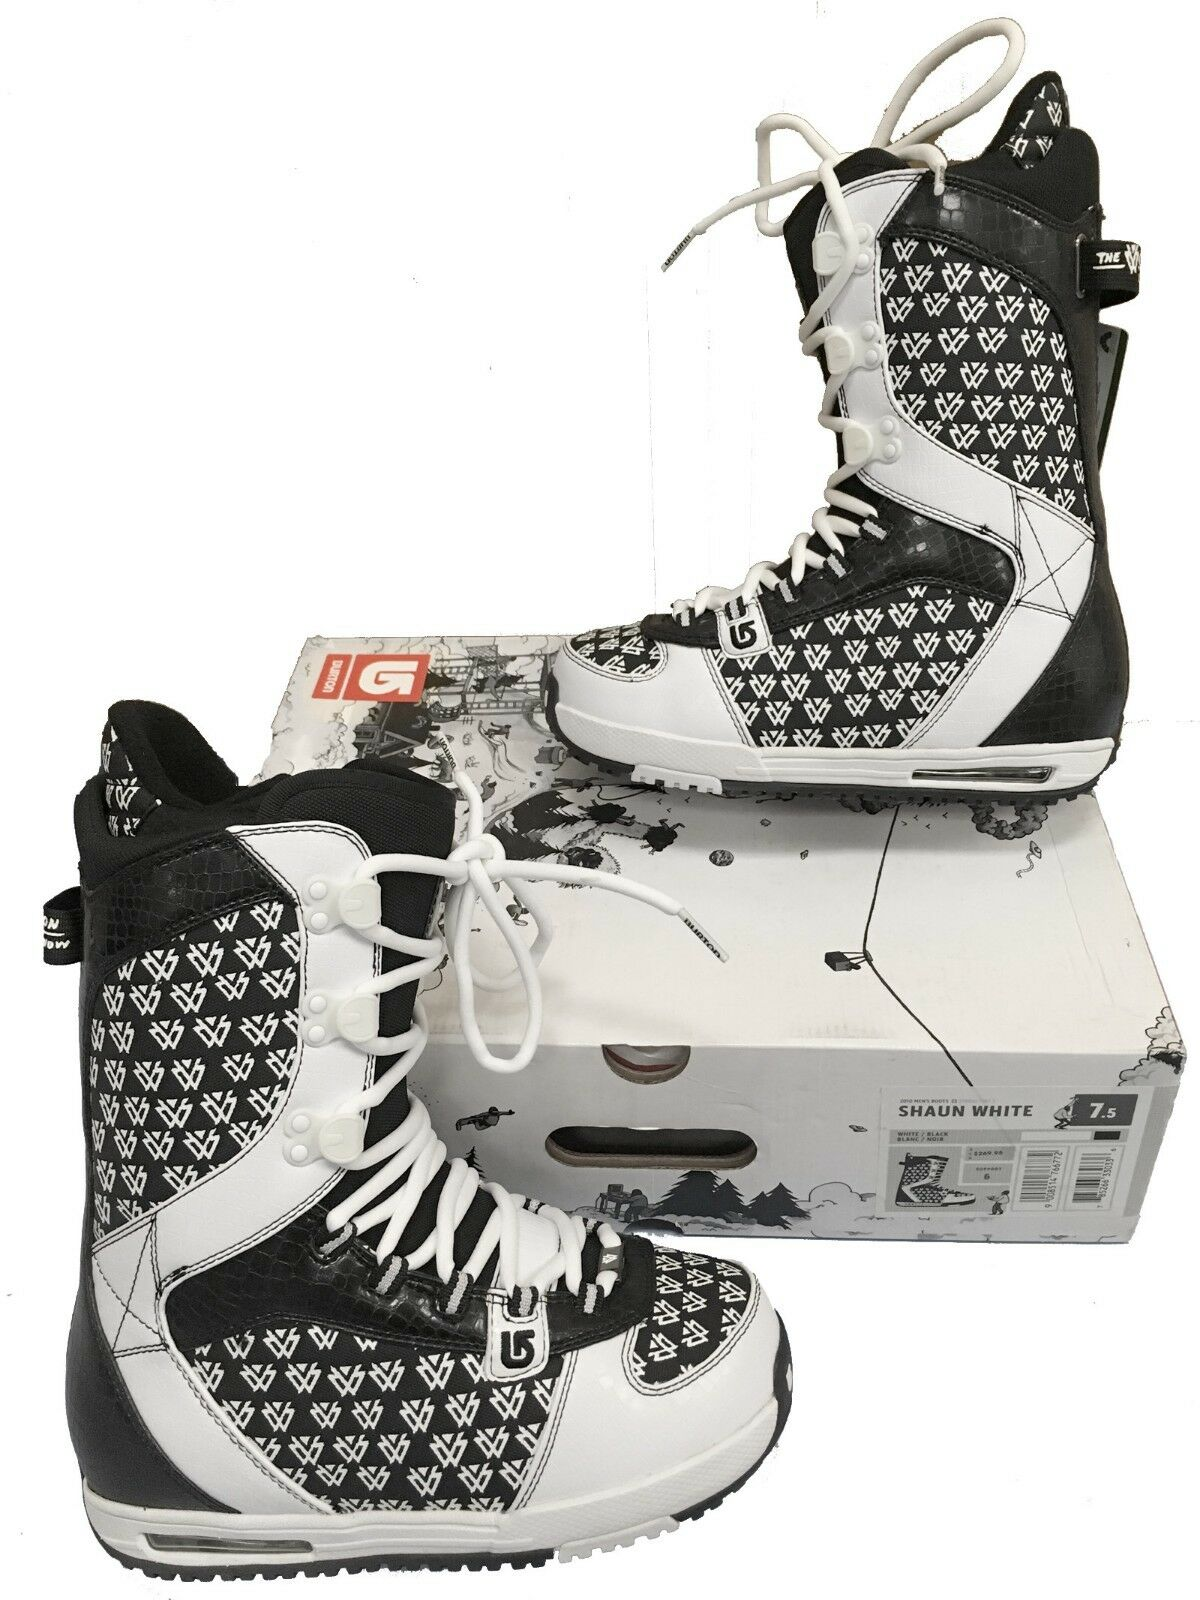 NEW  270 Burton Shaun White Snowboard Boots   US 7.5 Mondo 25.5 Euro 40.5